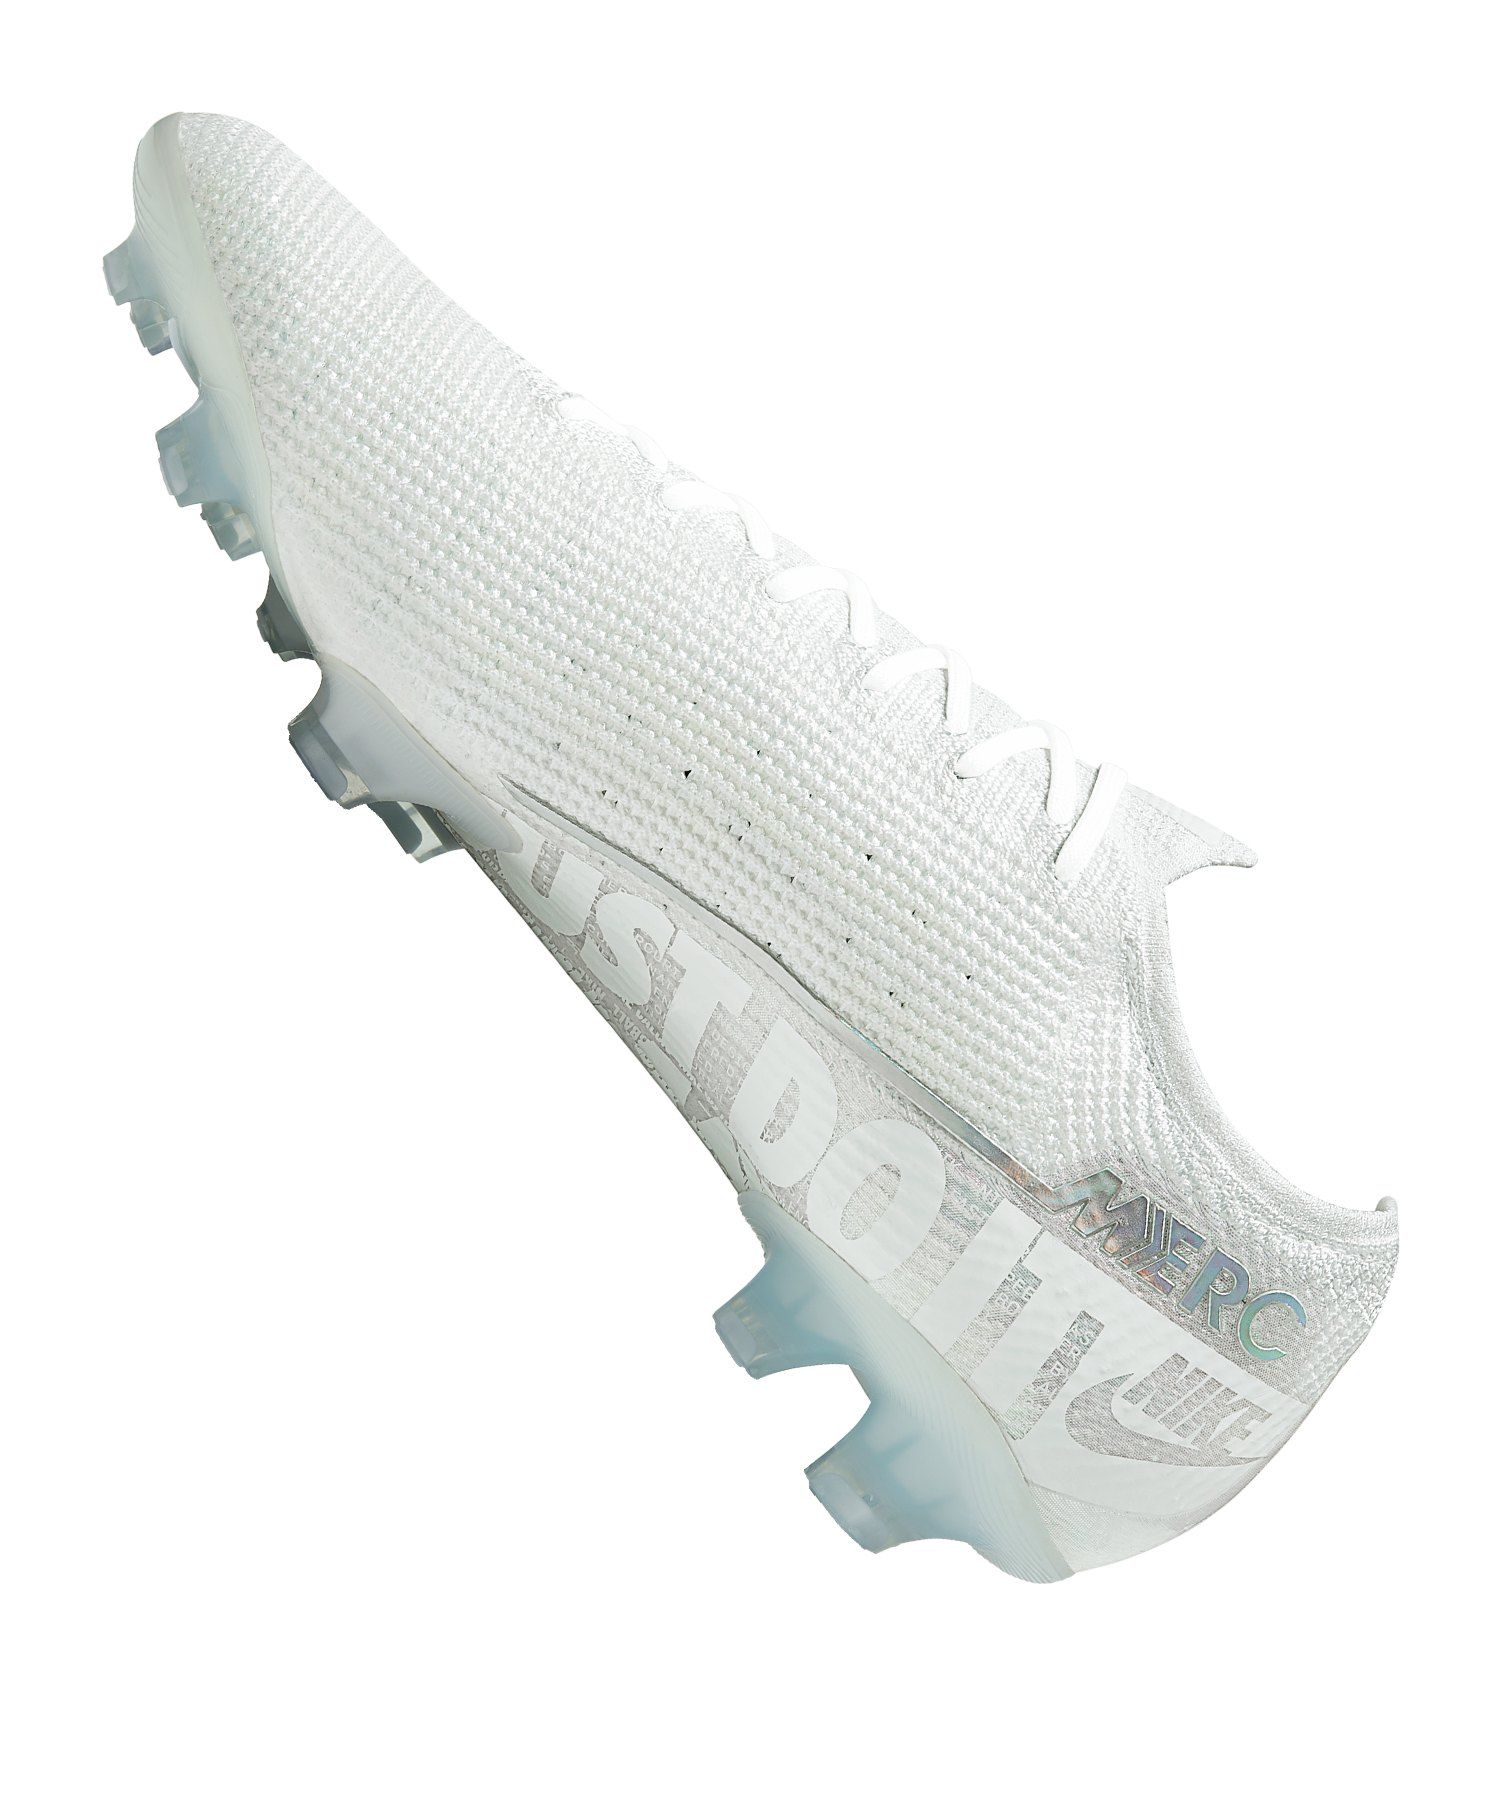 nike mercurial vapor 9 test, Nike Kaishi 2.0 Sneaker